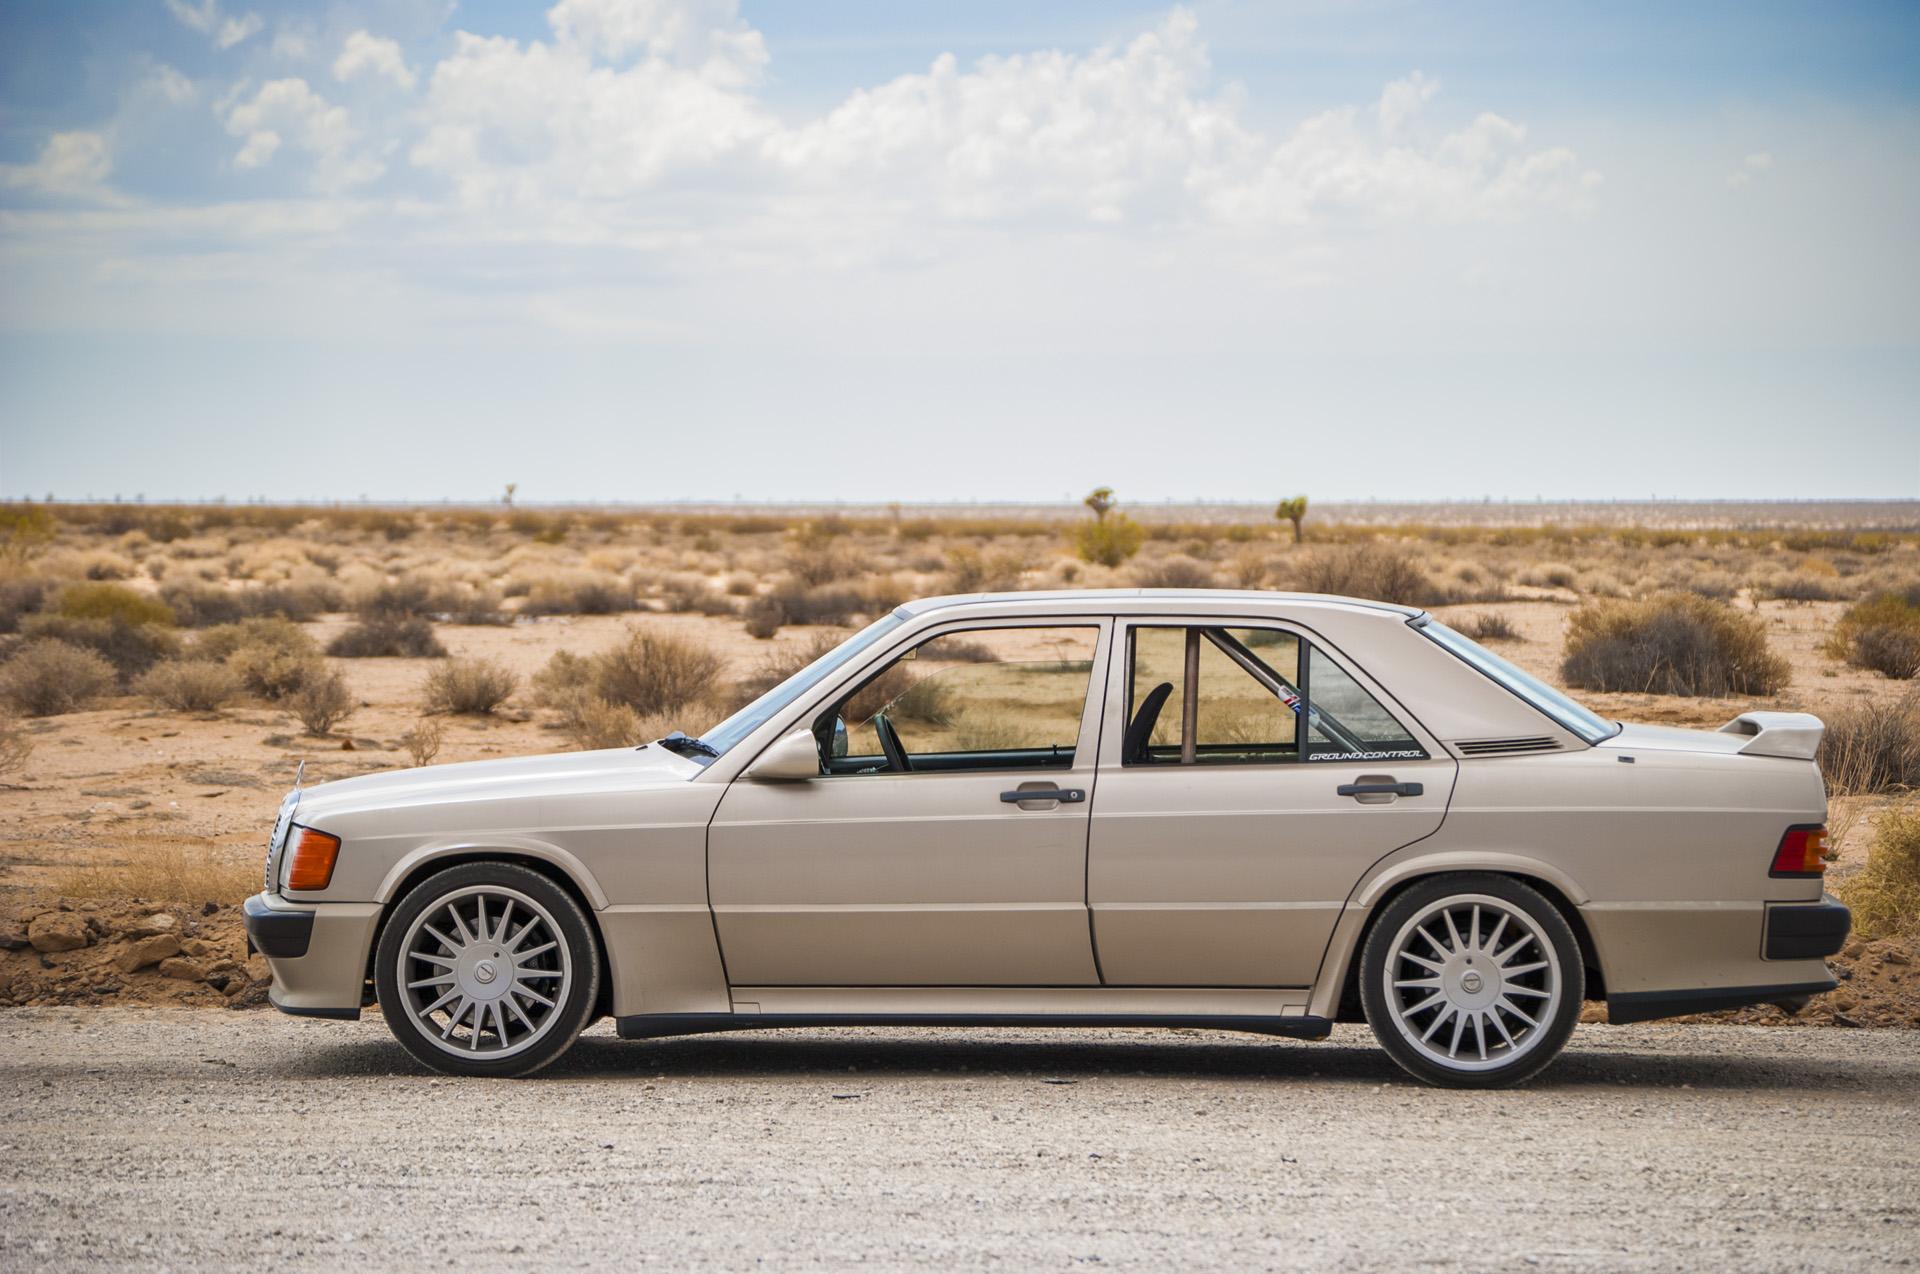 1984 mercedes benz 190e 2 3 16v for 1984 mercedes benz 190e